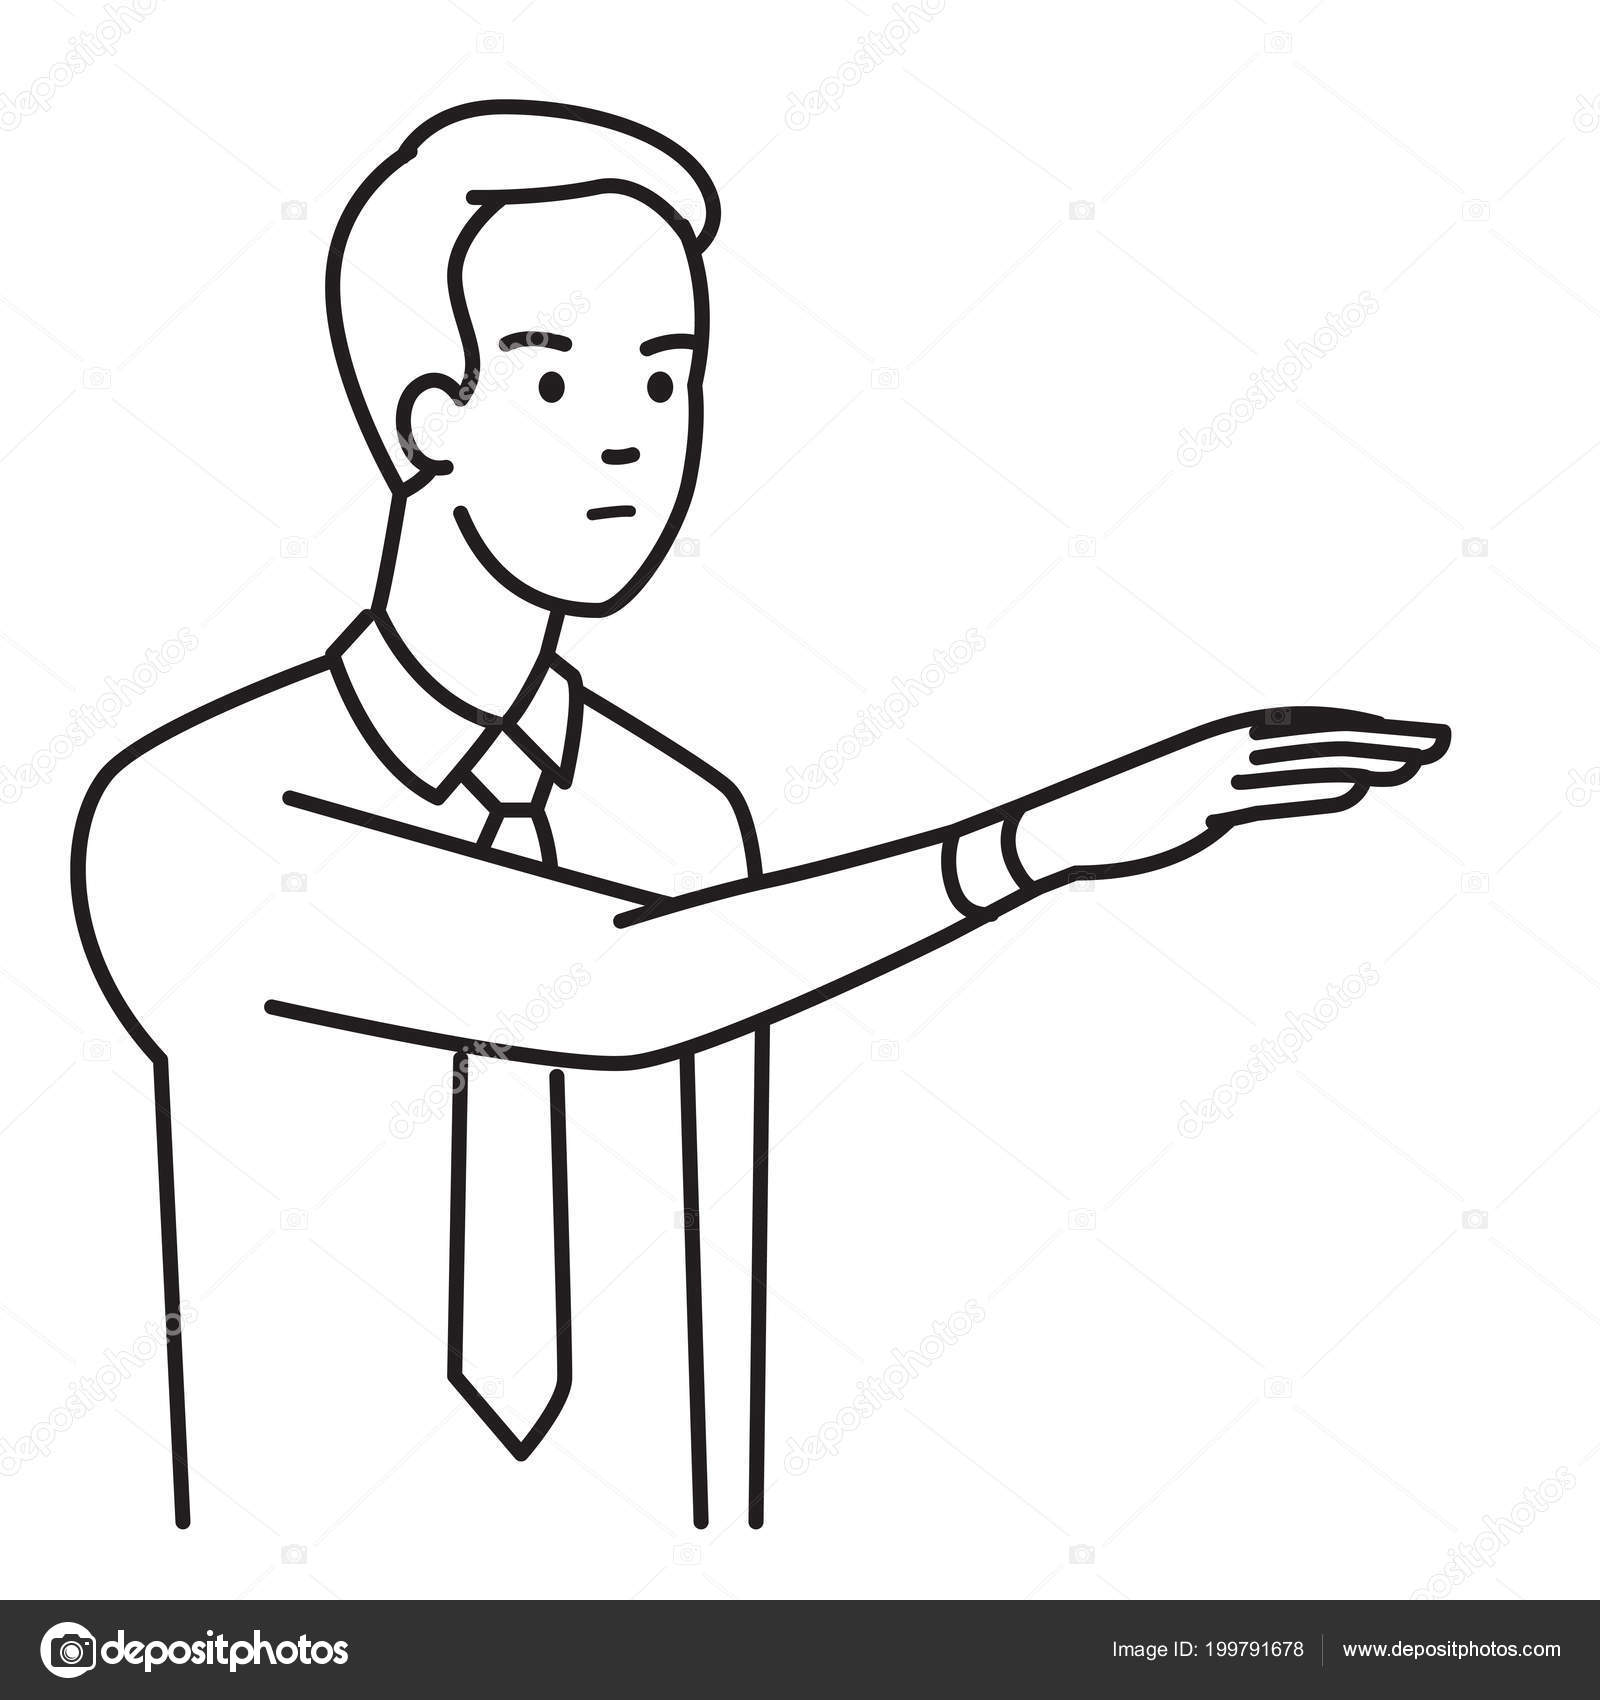 Businessman Showing Body Language Raised Hand Gesturing Palm